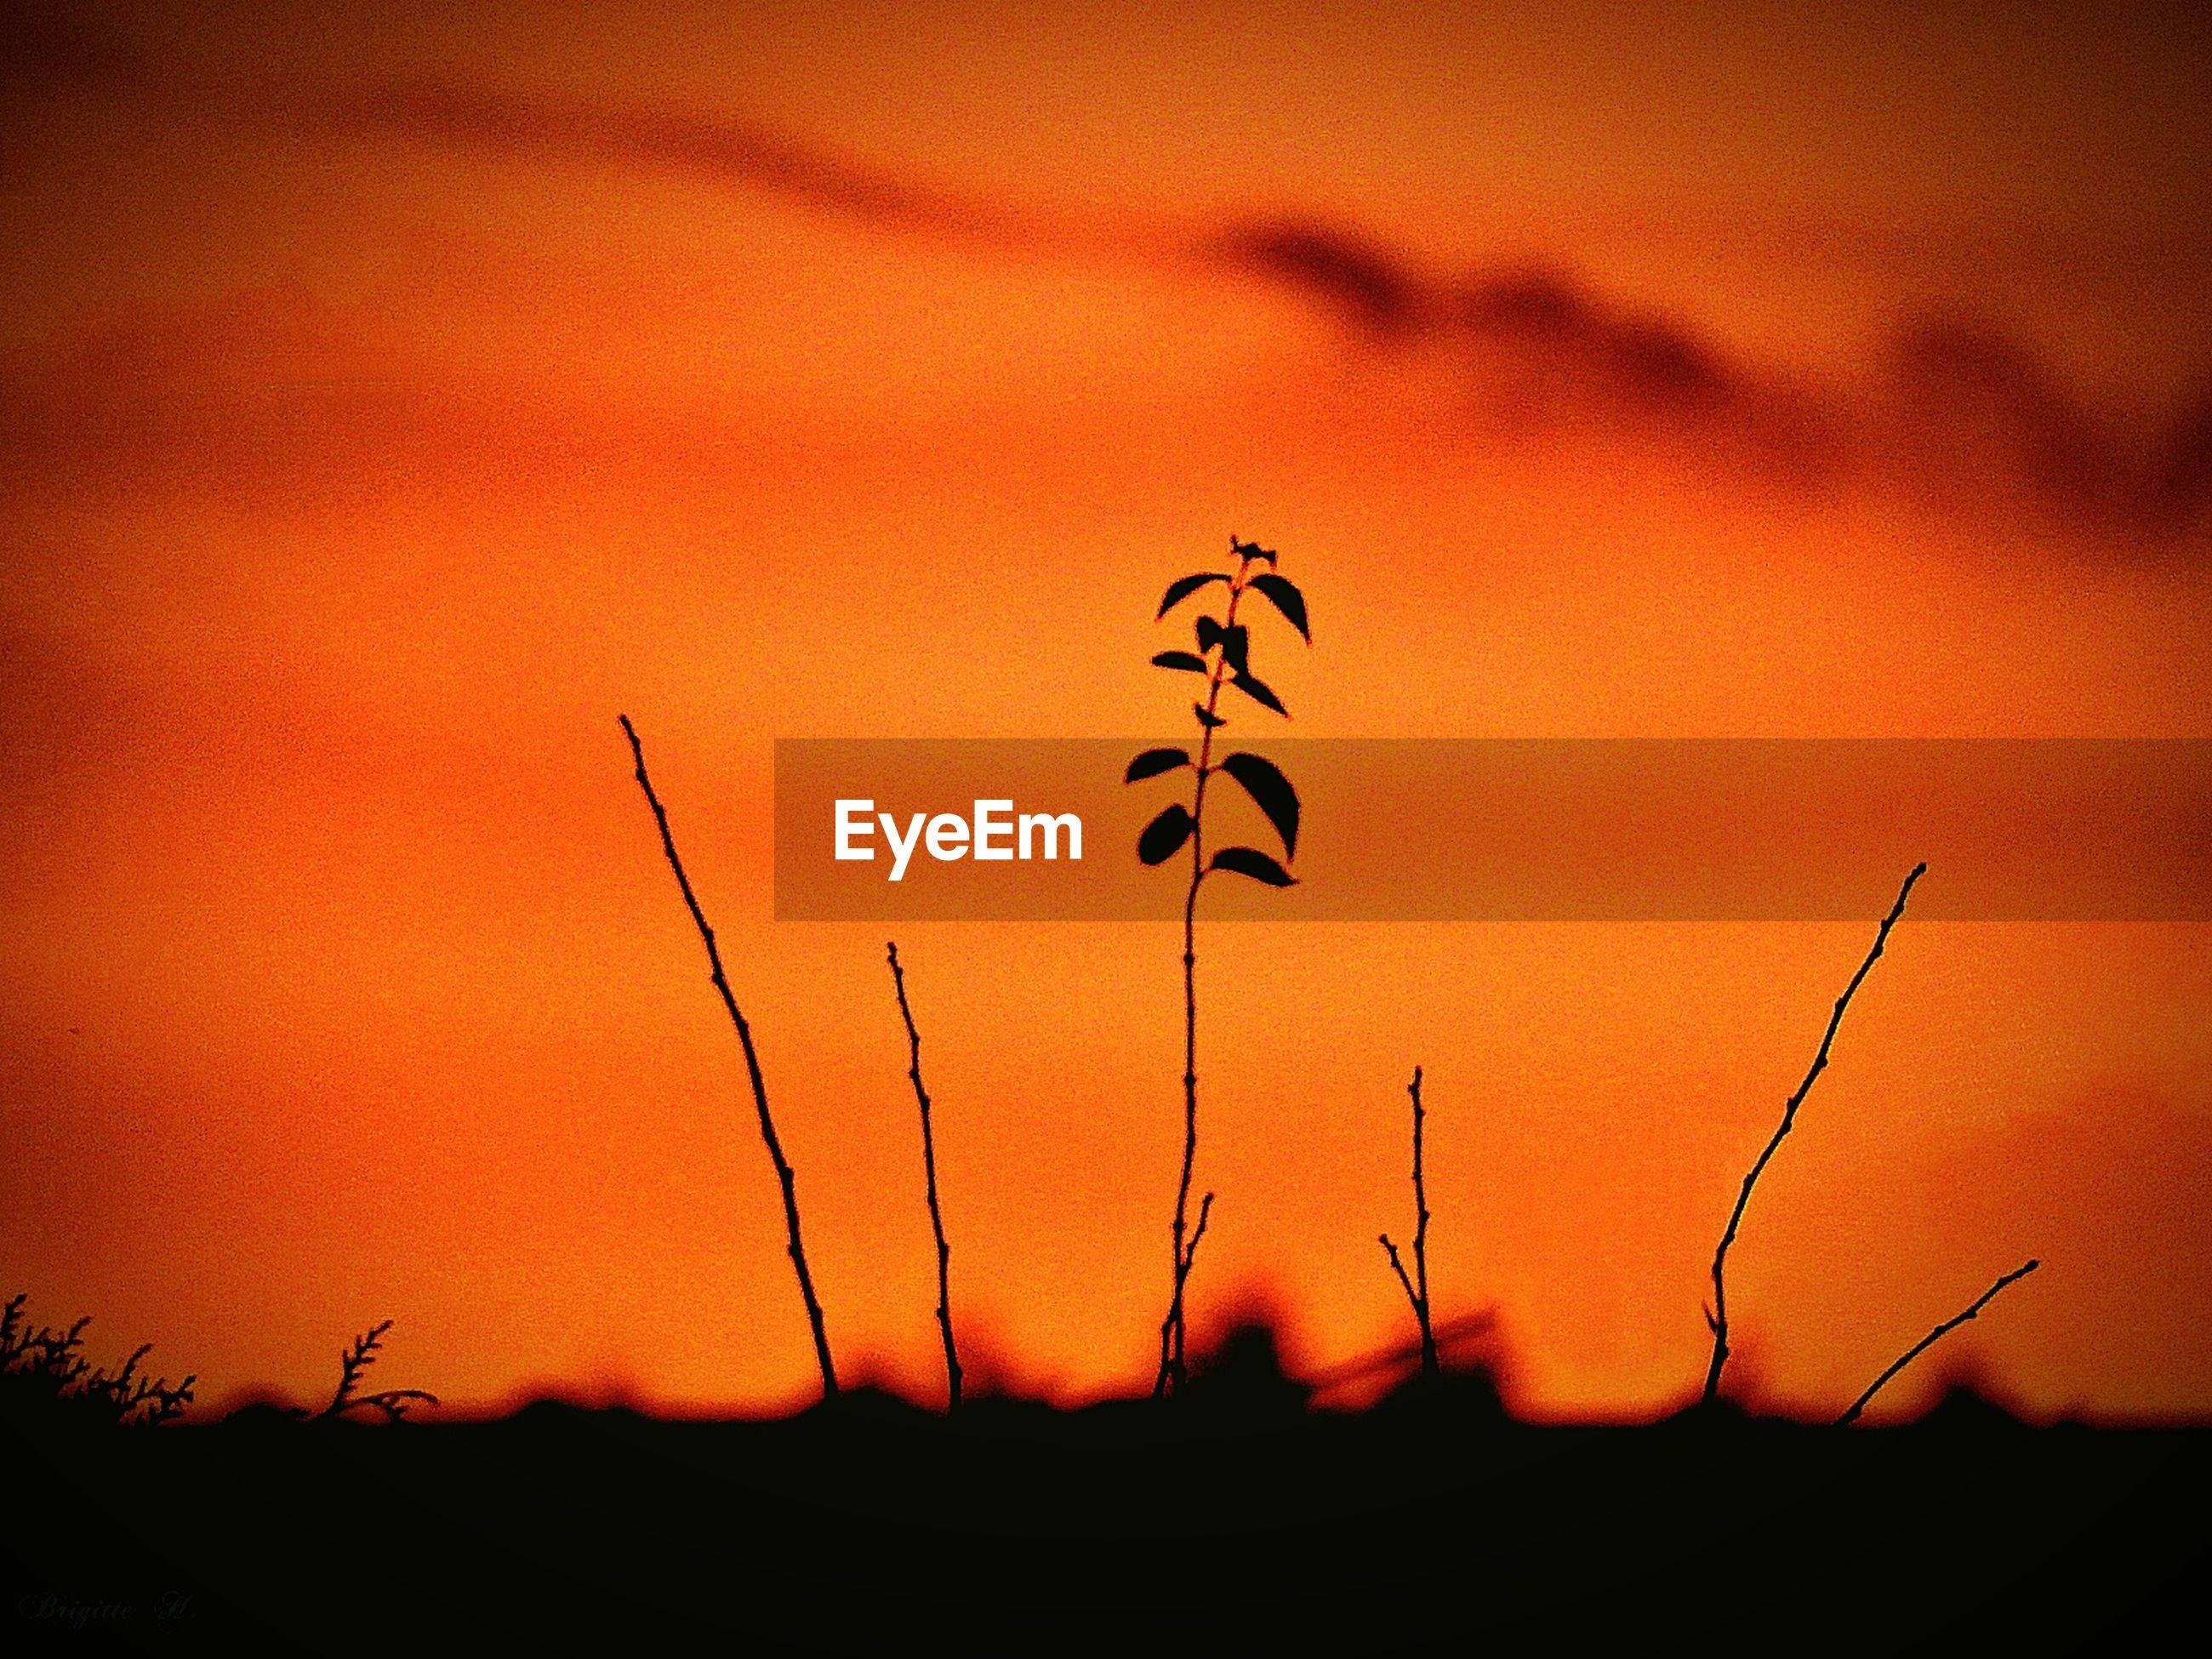 SILHOUETTE PLANT AGAINST ORANGE SKY